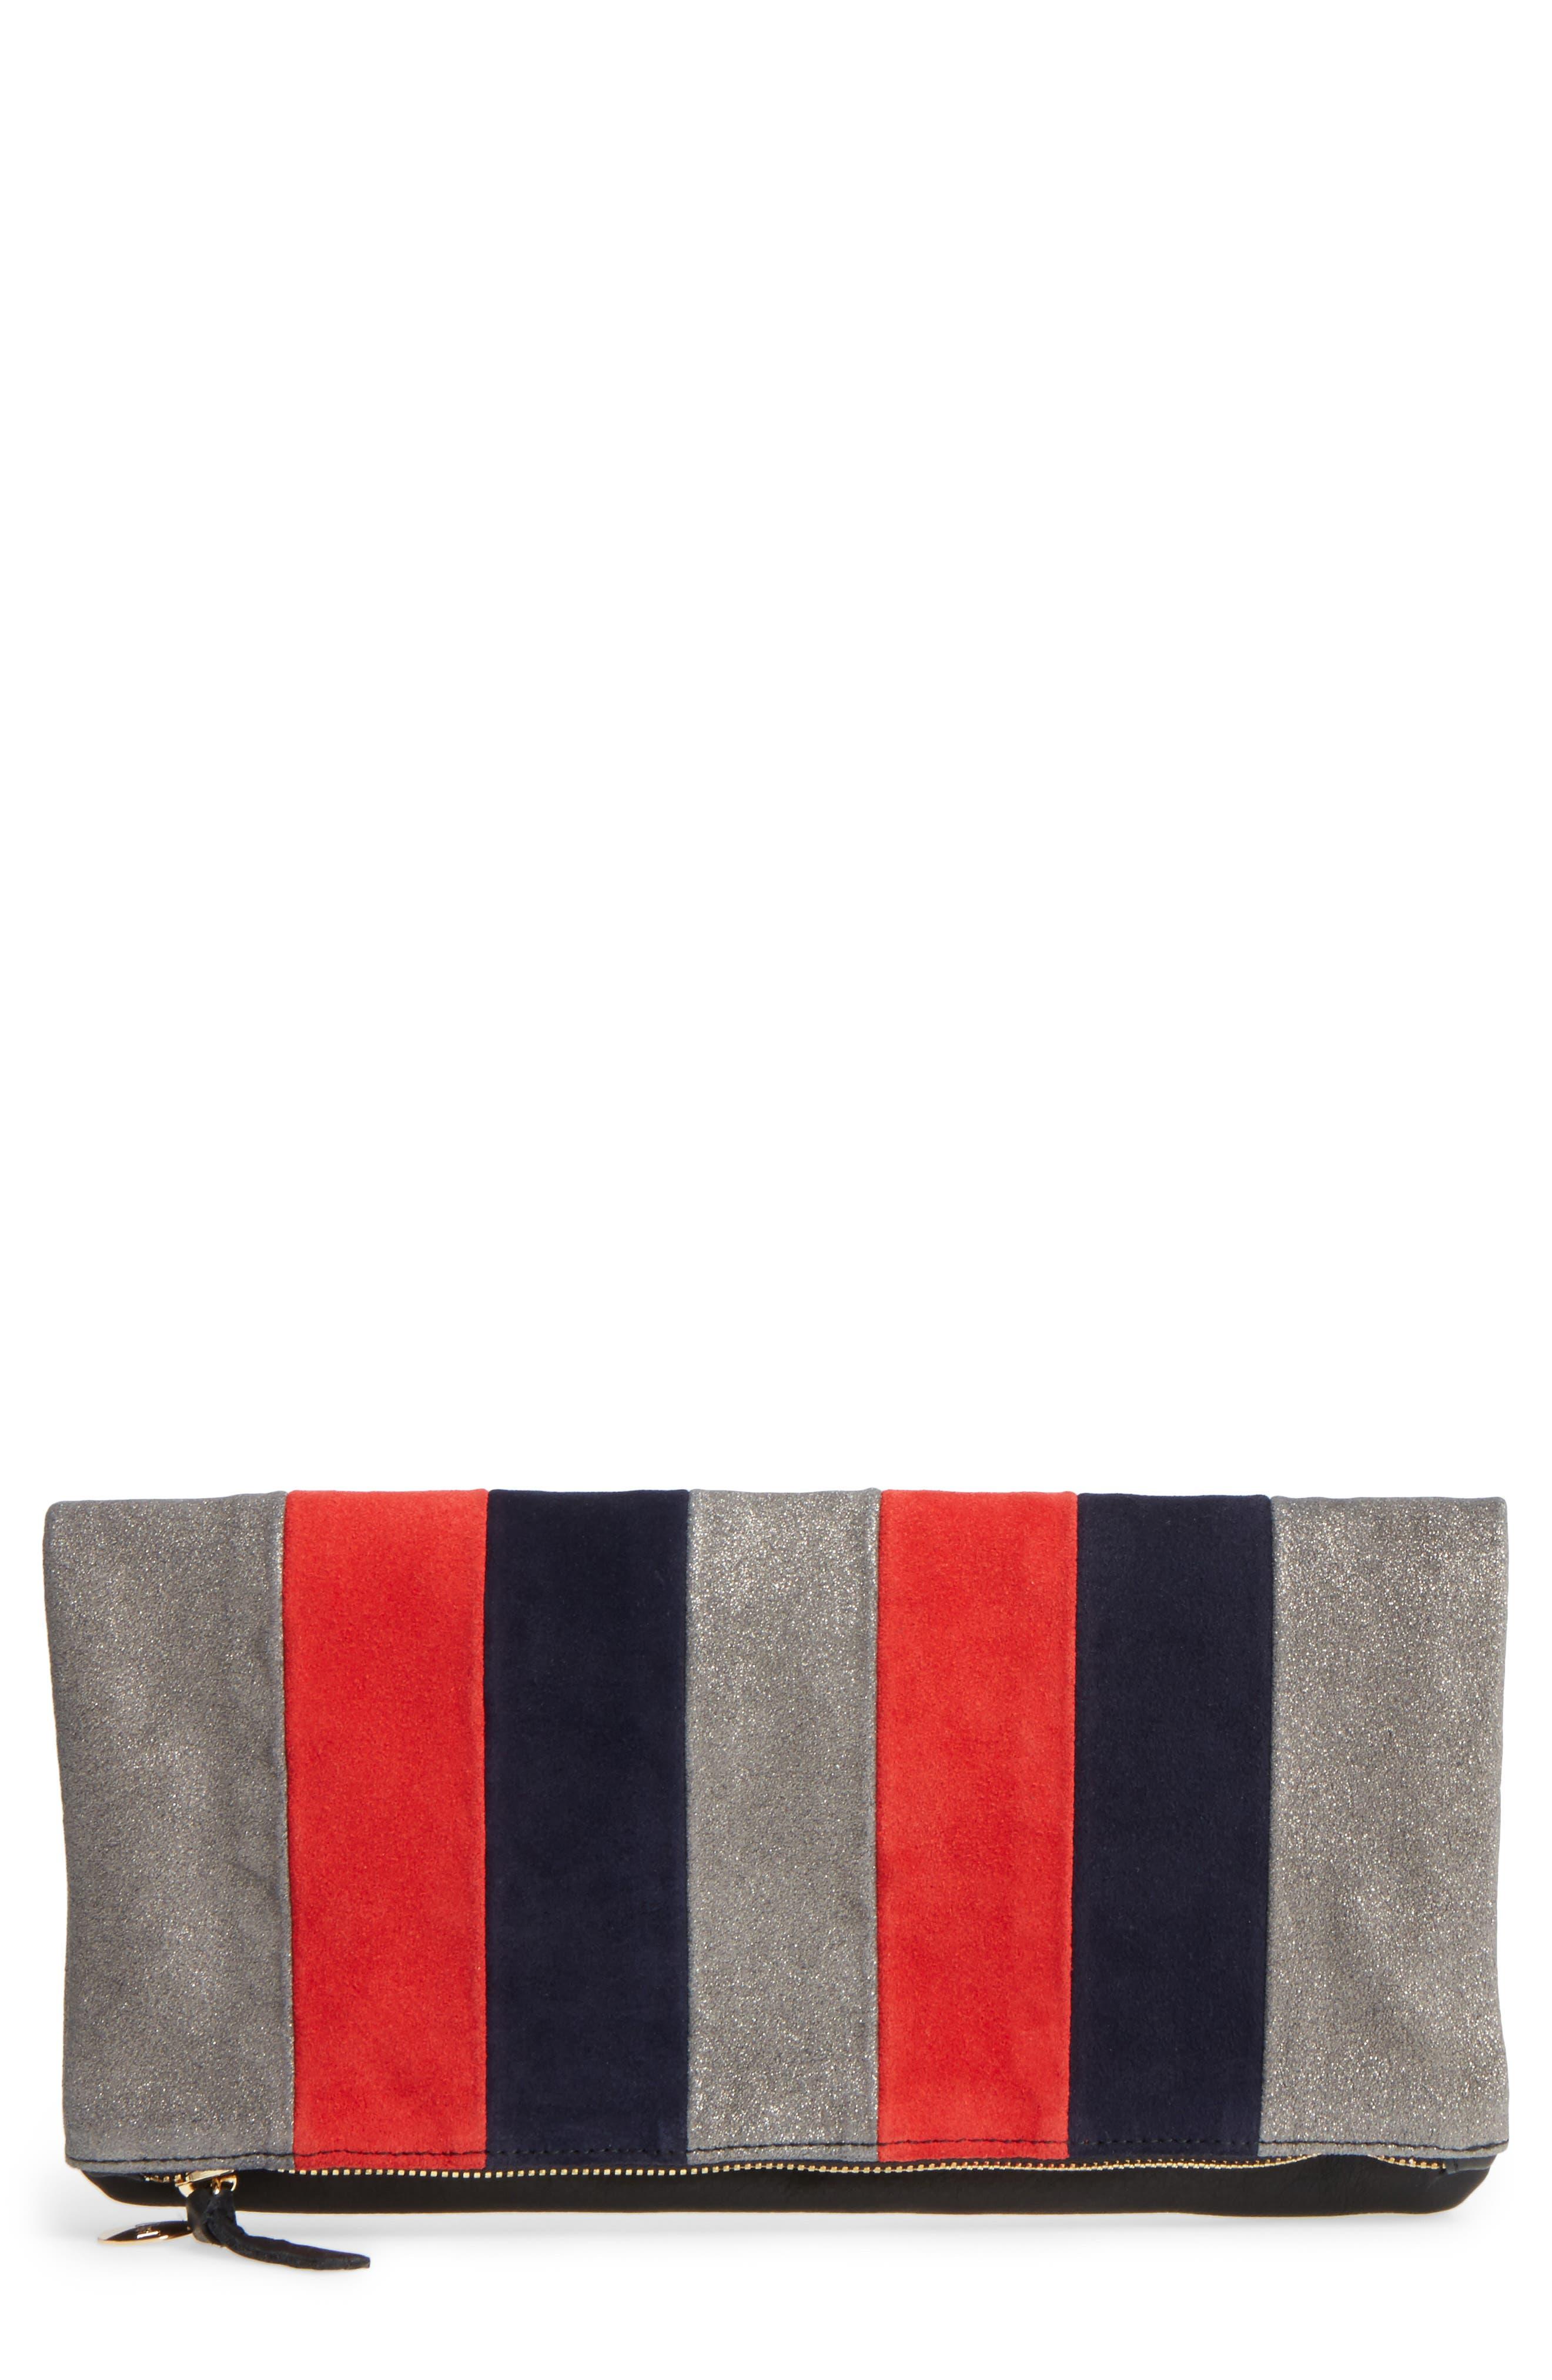 Mixed Media Stripe Leather Foldover Clutch,                         Main,                         color, Zanzibar Stripe